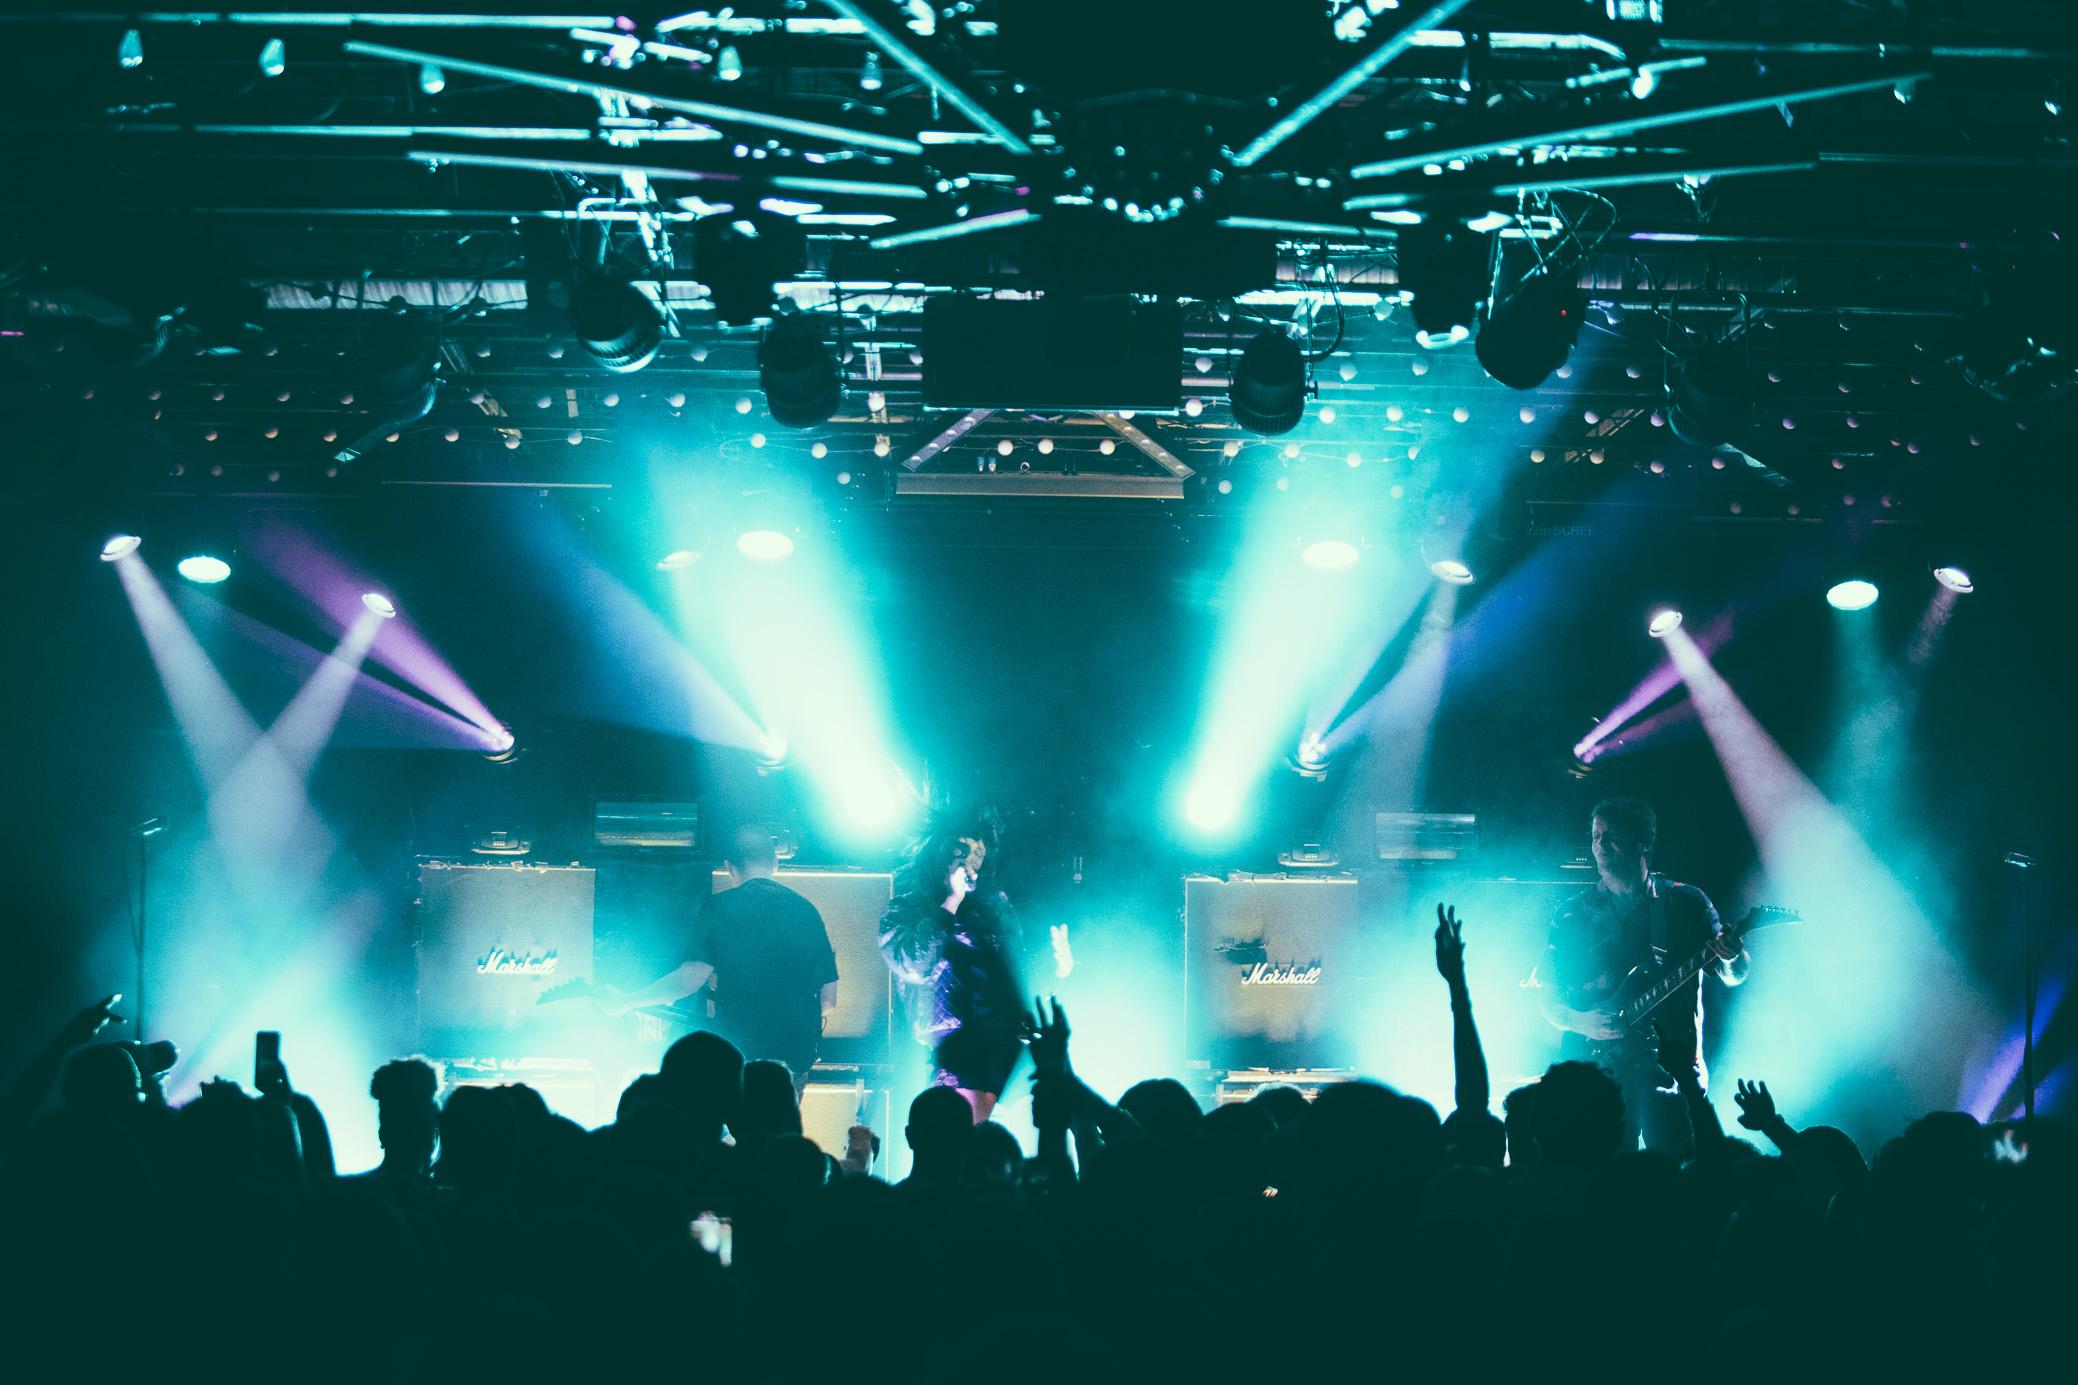 Sleigh Bells perform at Saturn Birmingham in Birmingham, Alabama on March 7th, 2017.   (Photo by David A. Smith/DSmithScenes)